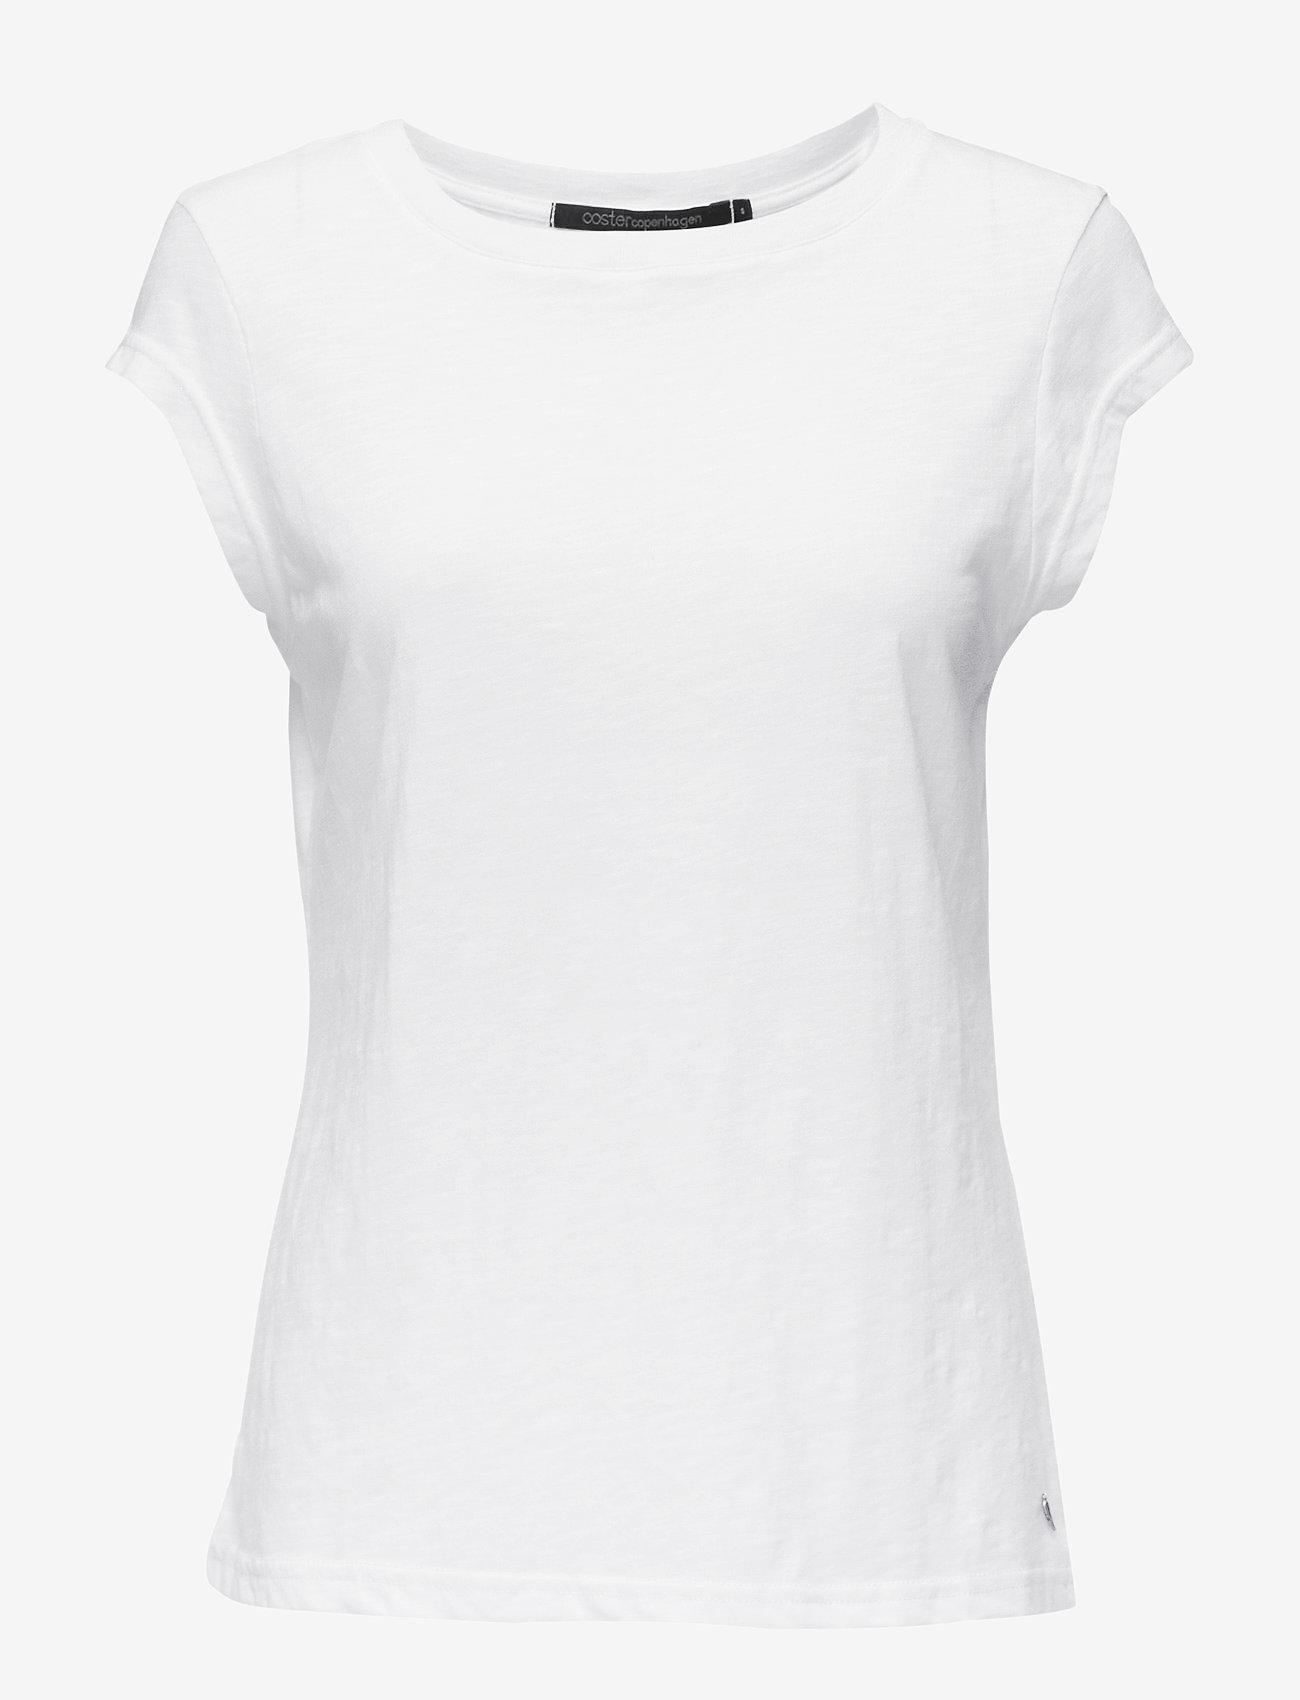 Coster Copenhagen - CC Heart basic t-shirt (B0017) - t-krekli - white - 0